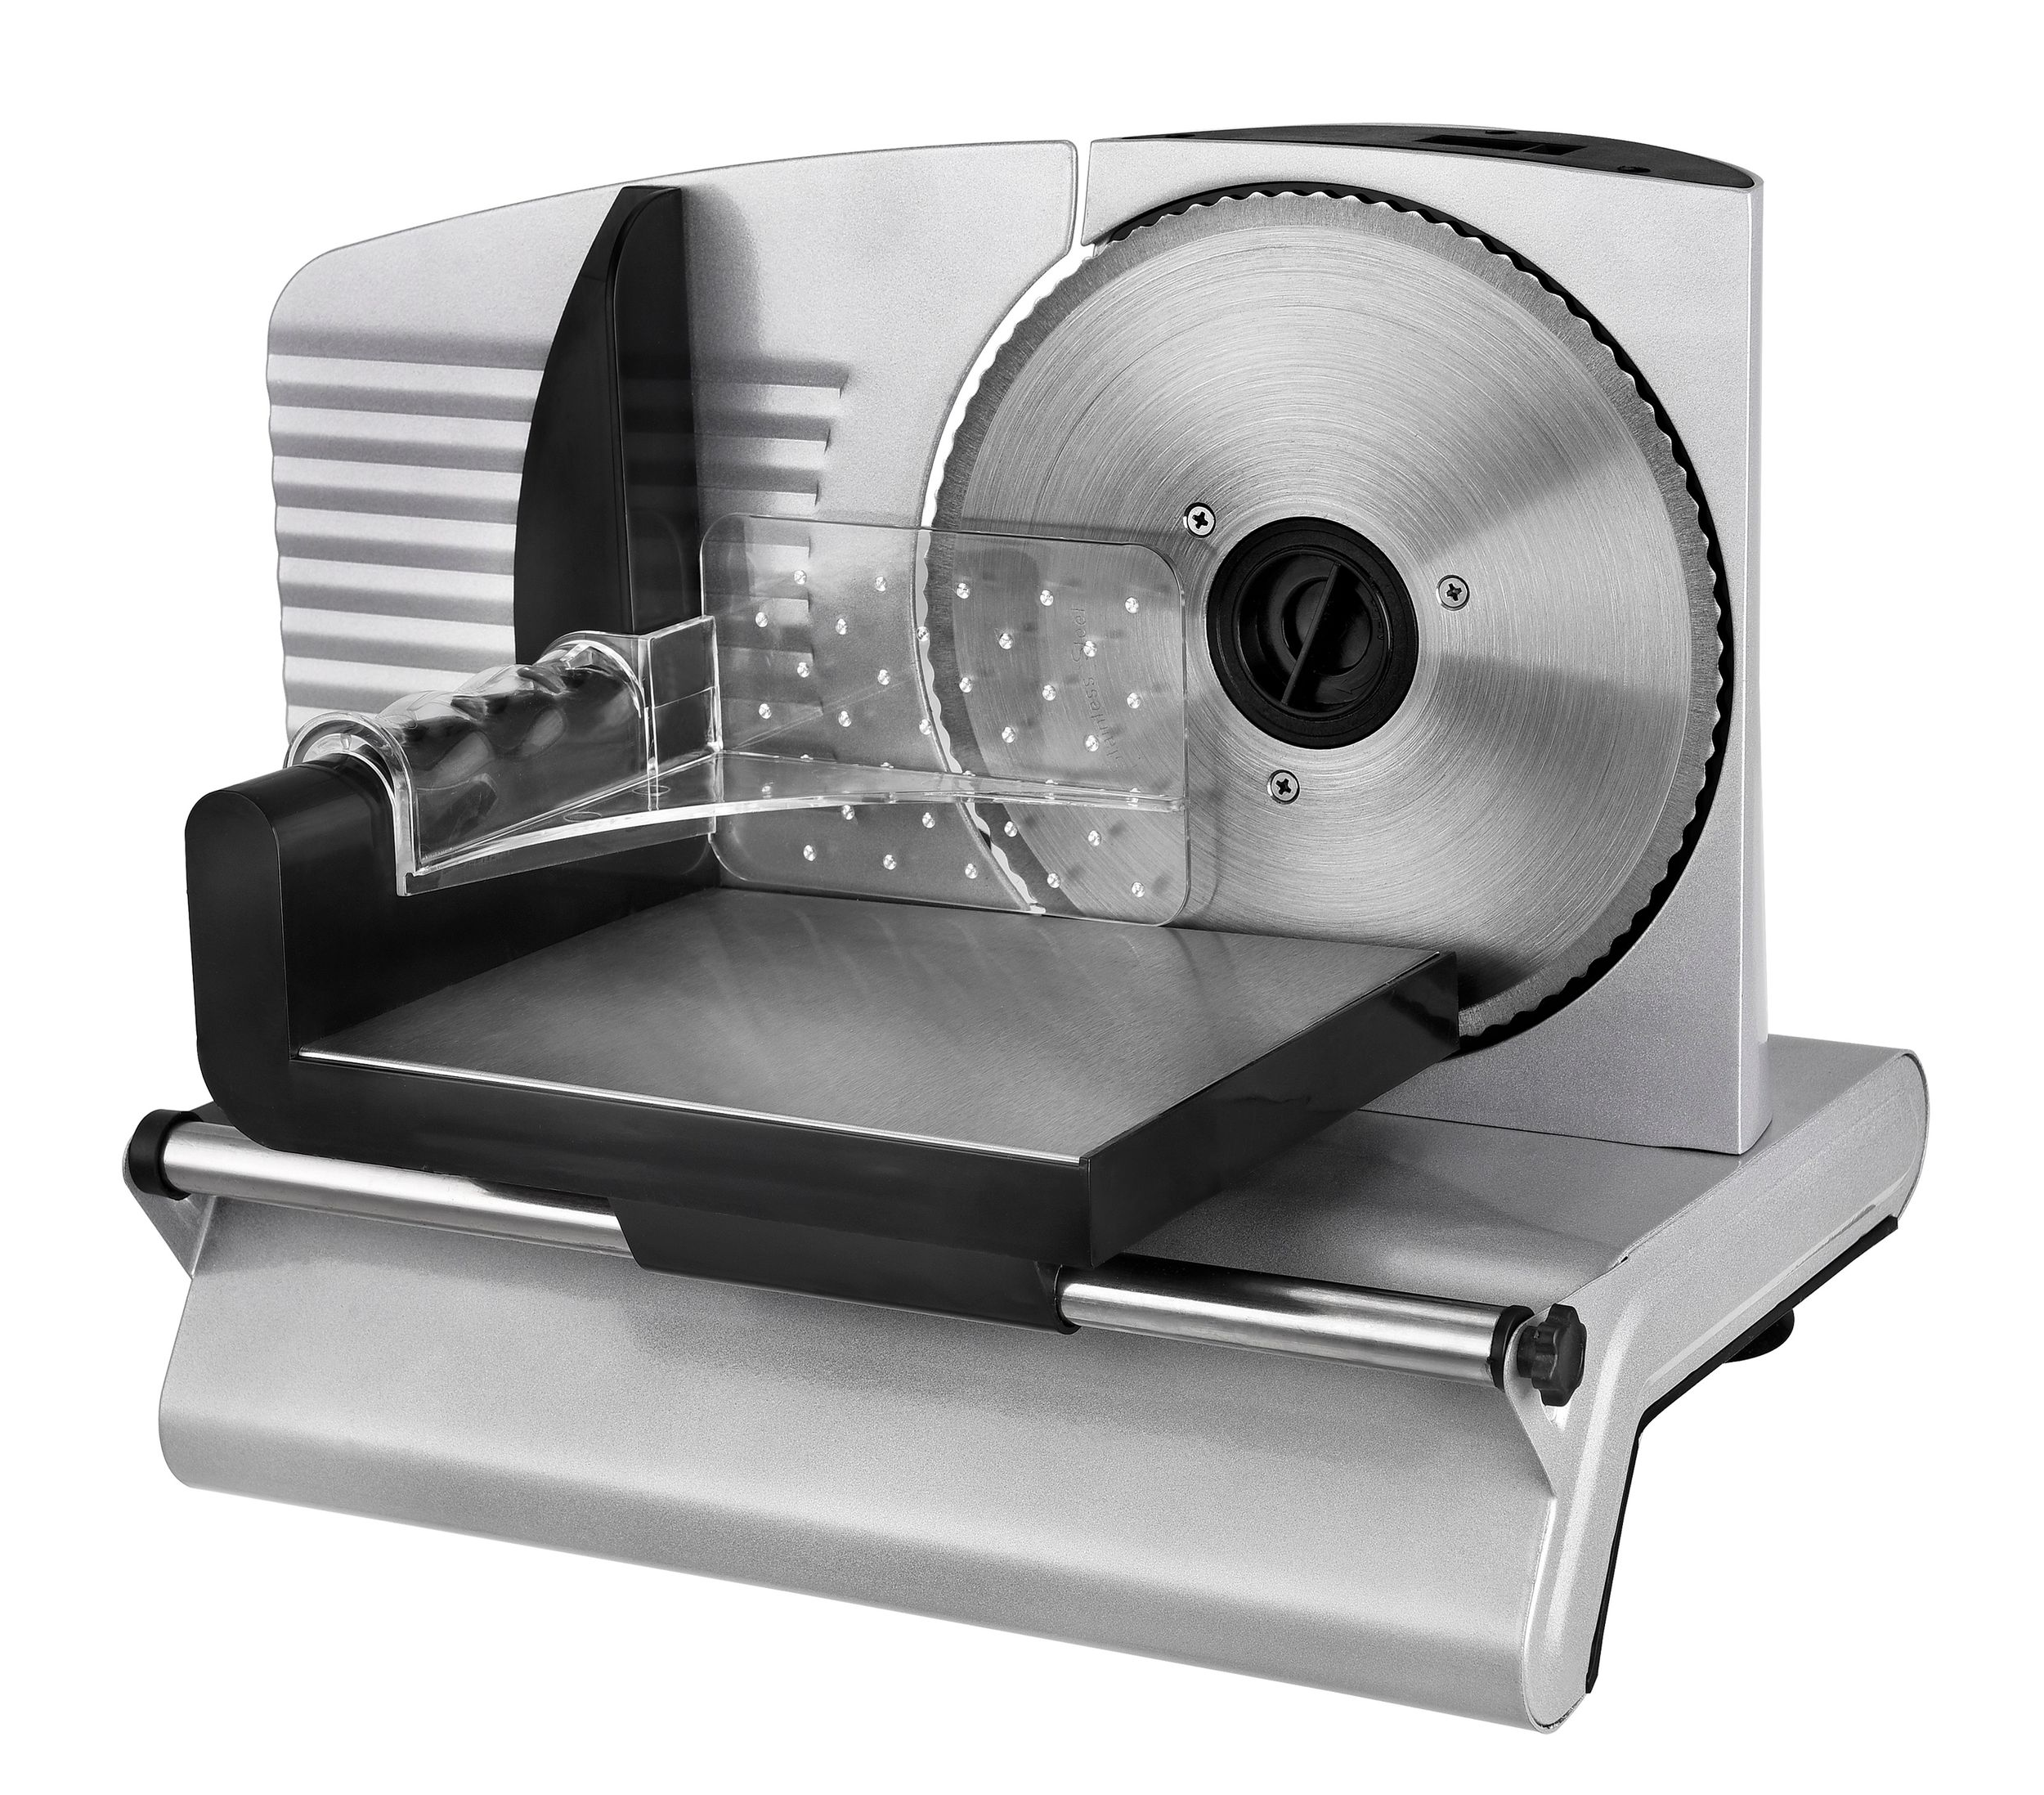 Metall Allesschneider Brotschneidemaschine Brotschneider Edelstahlmesser 19 cm NEU*89513